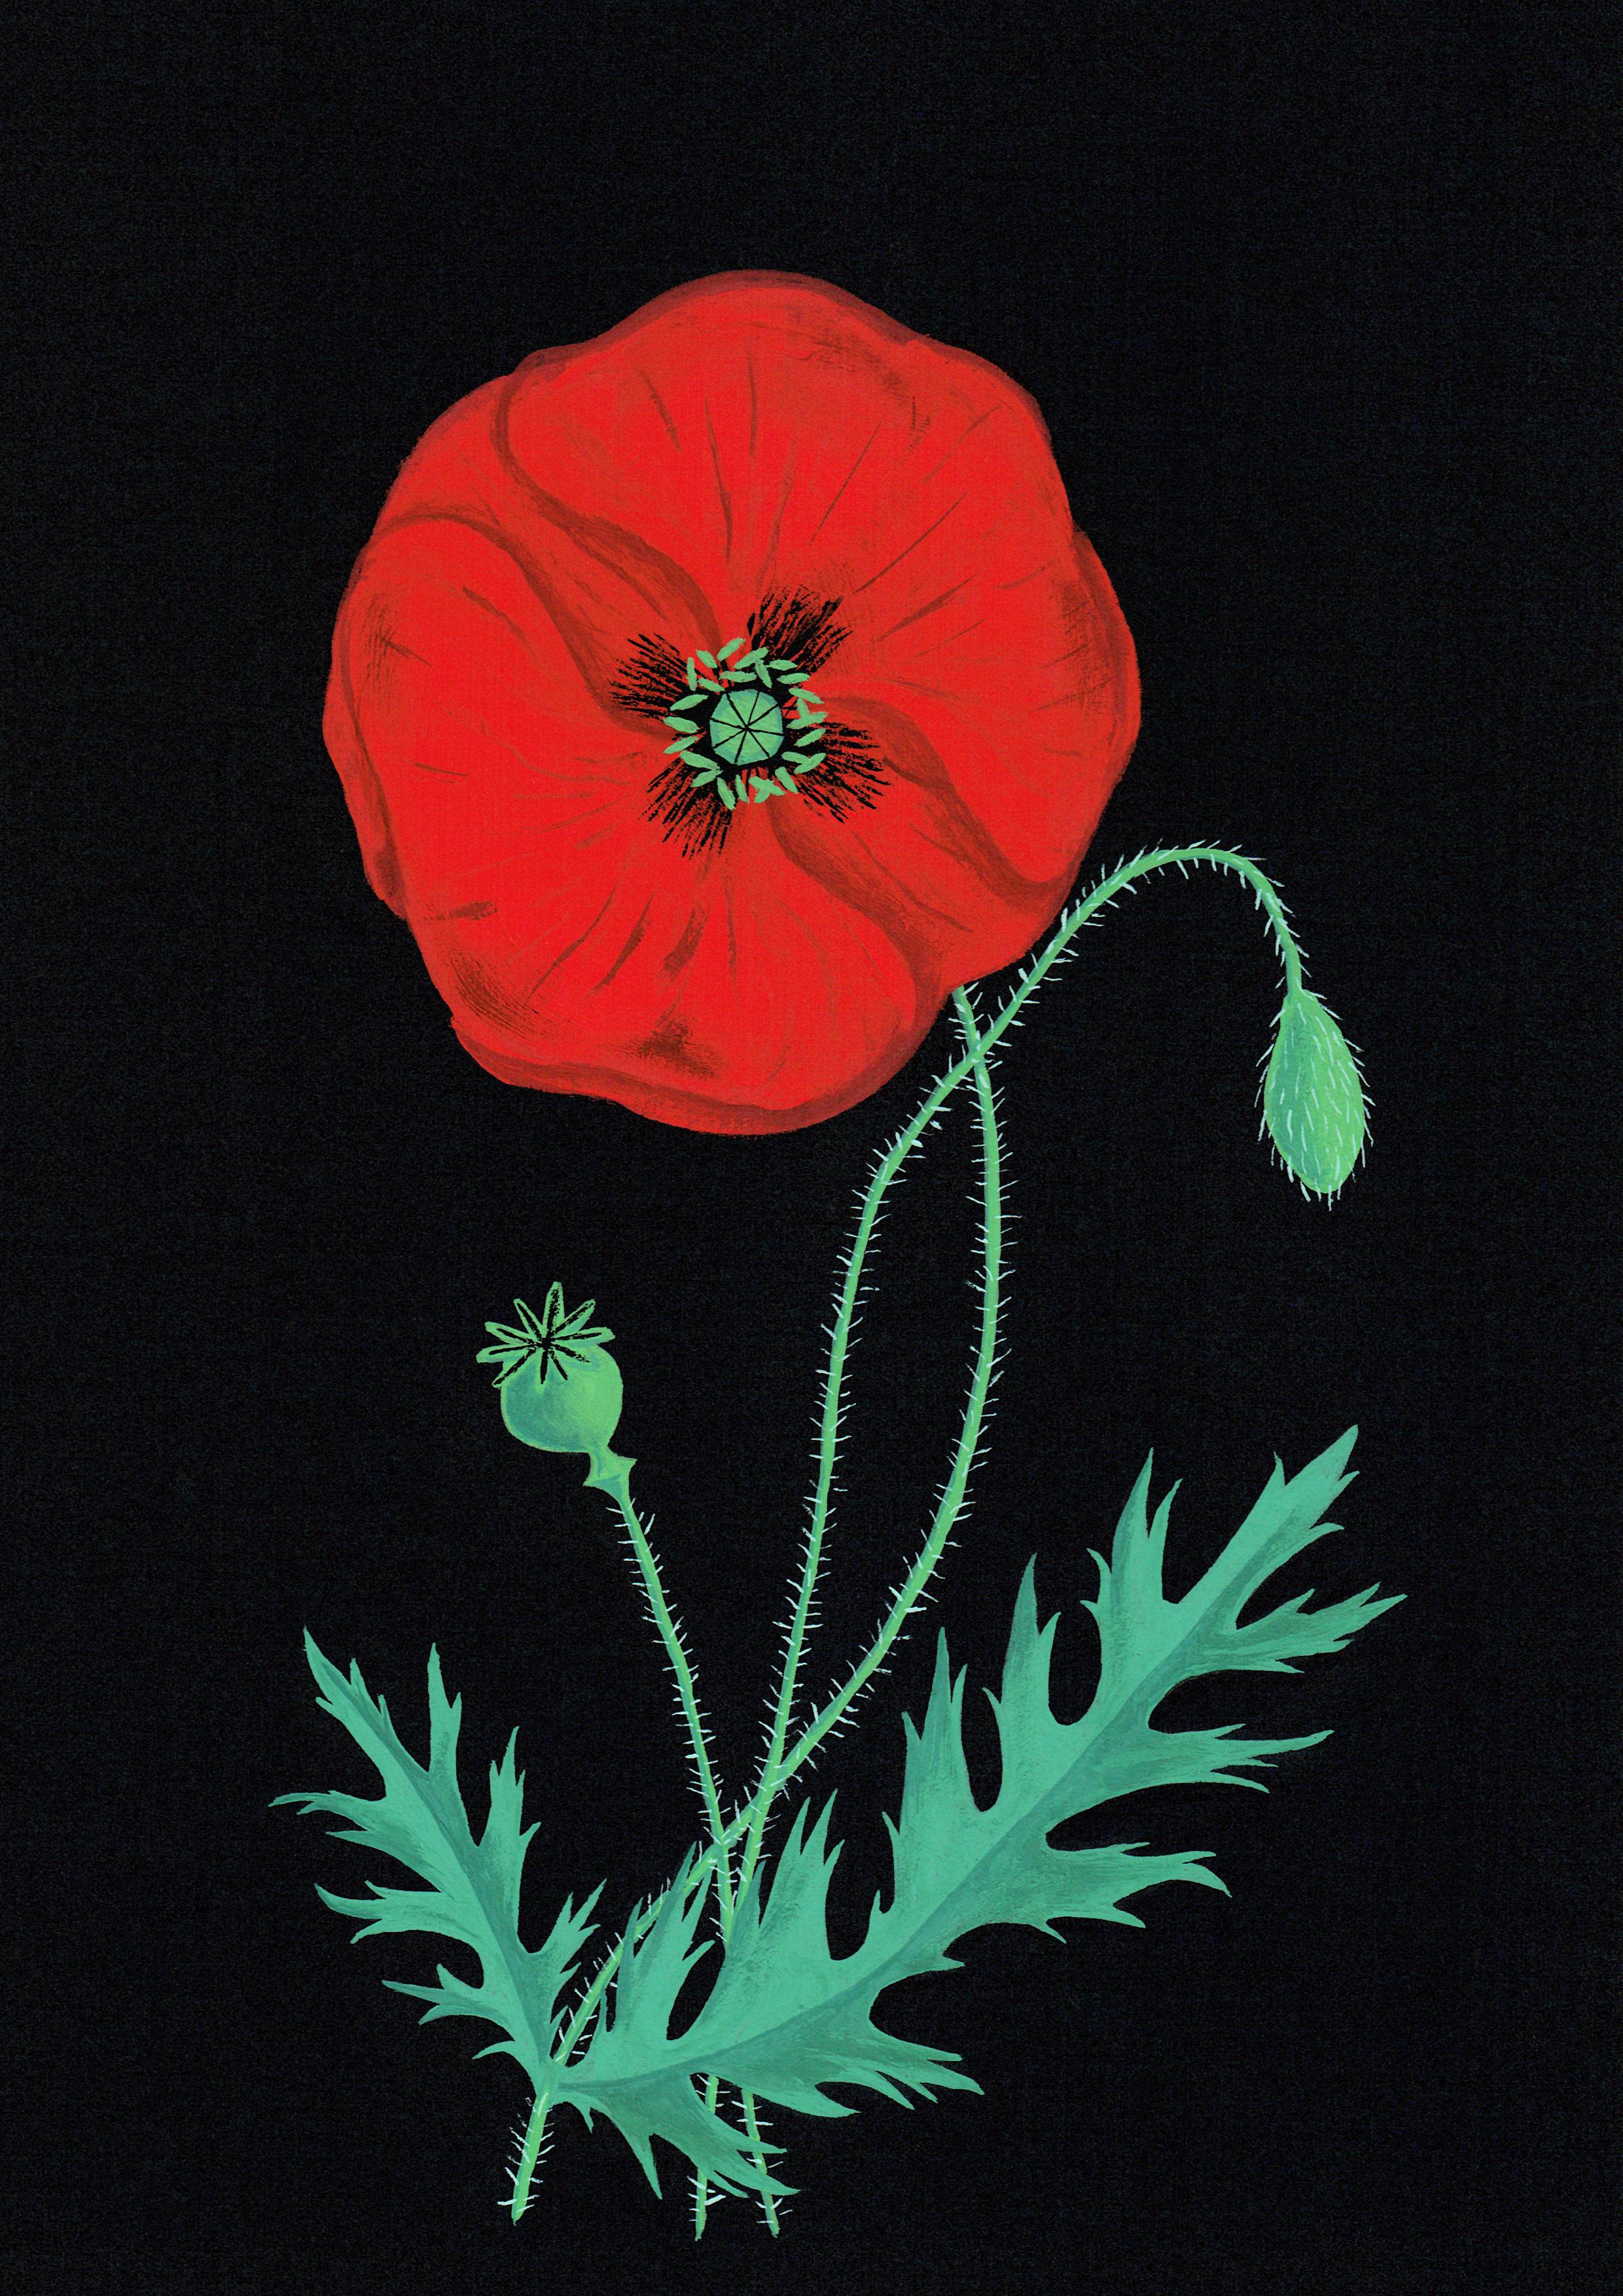 Poppy design for the Auckland War Memorial Museum.